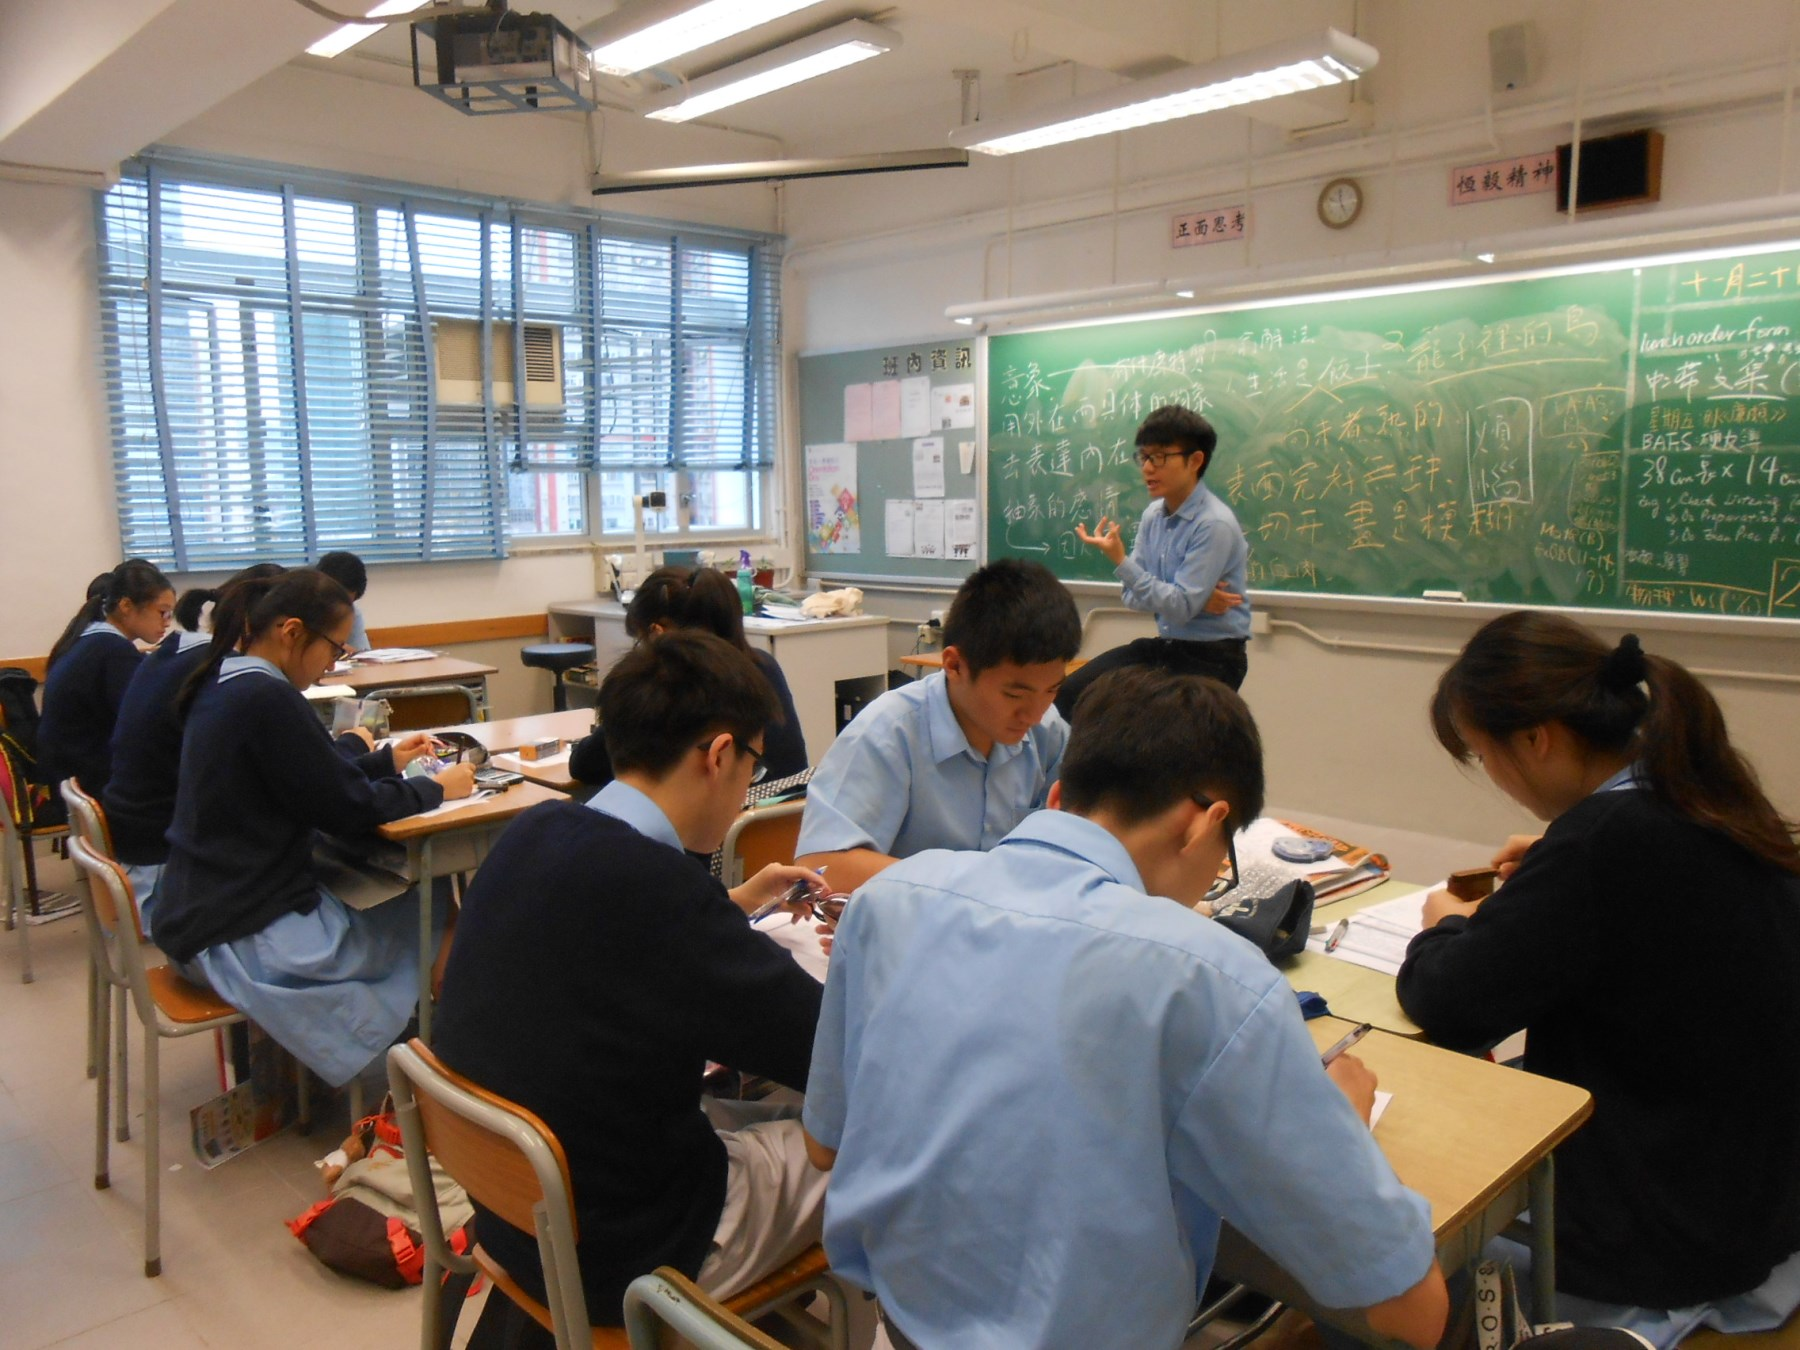 http://npc.edu.hk/sites/default/files/dscn9150.jpg